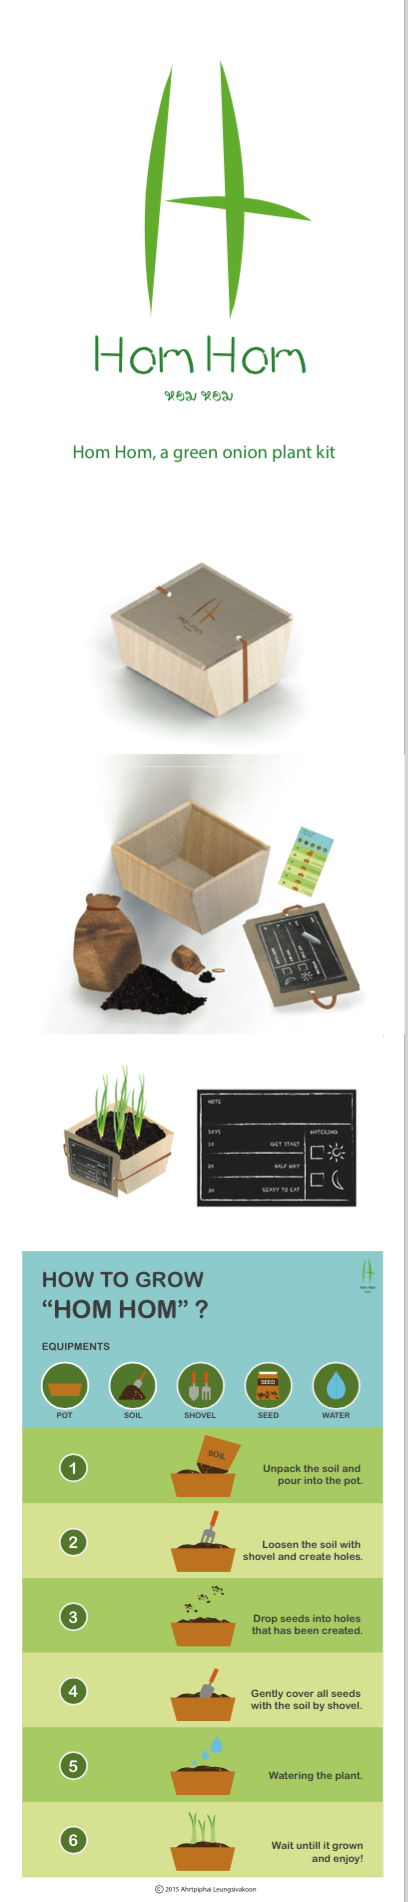 Hom Hom, a green onion plant kit. package design, graphic design, logo design